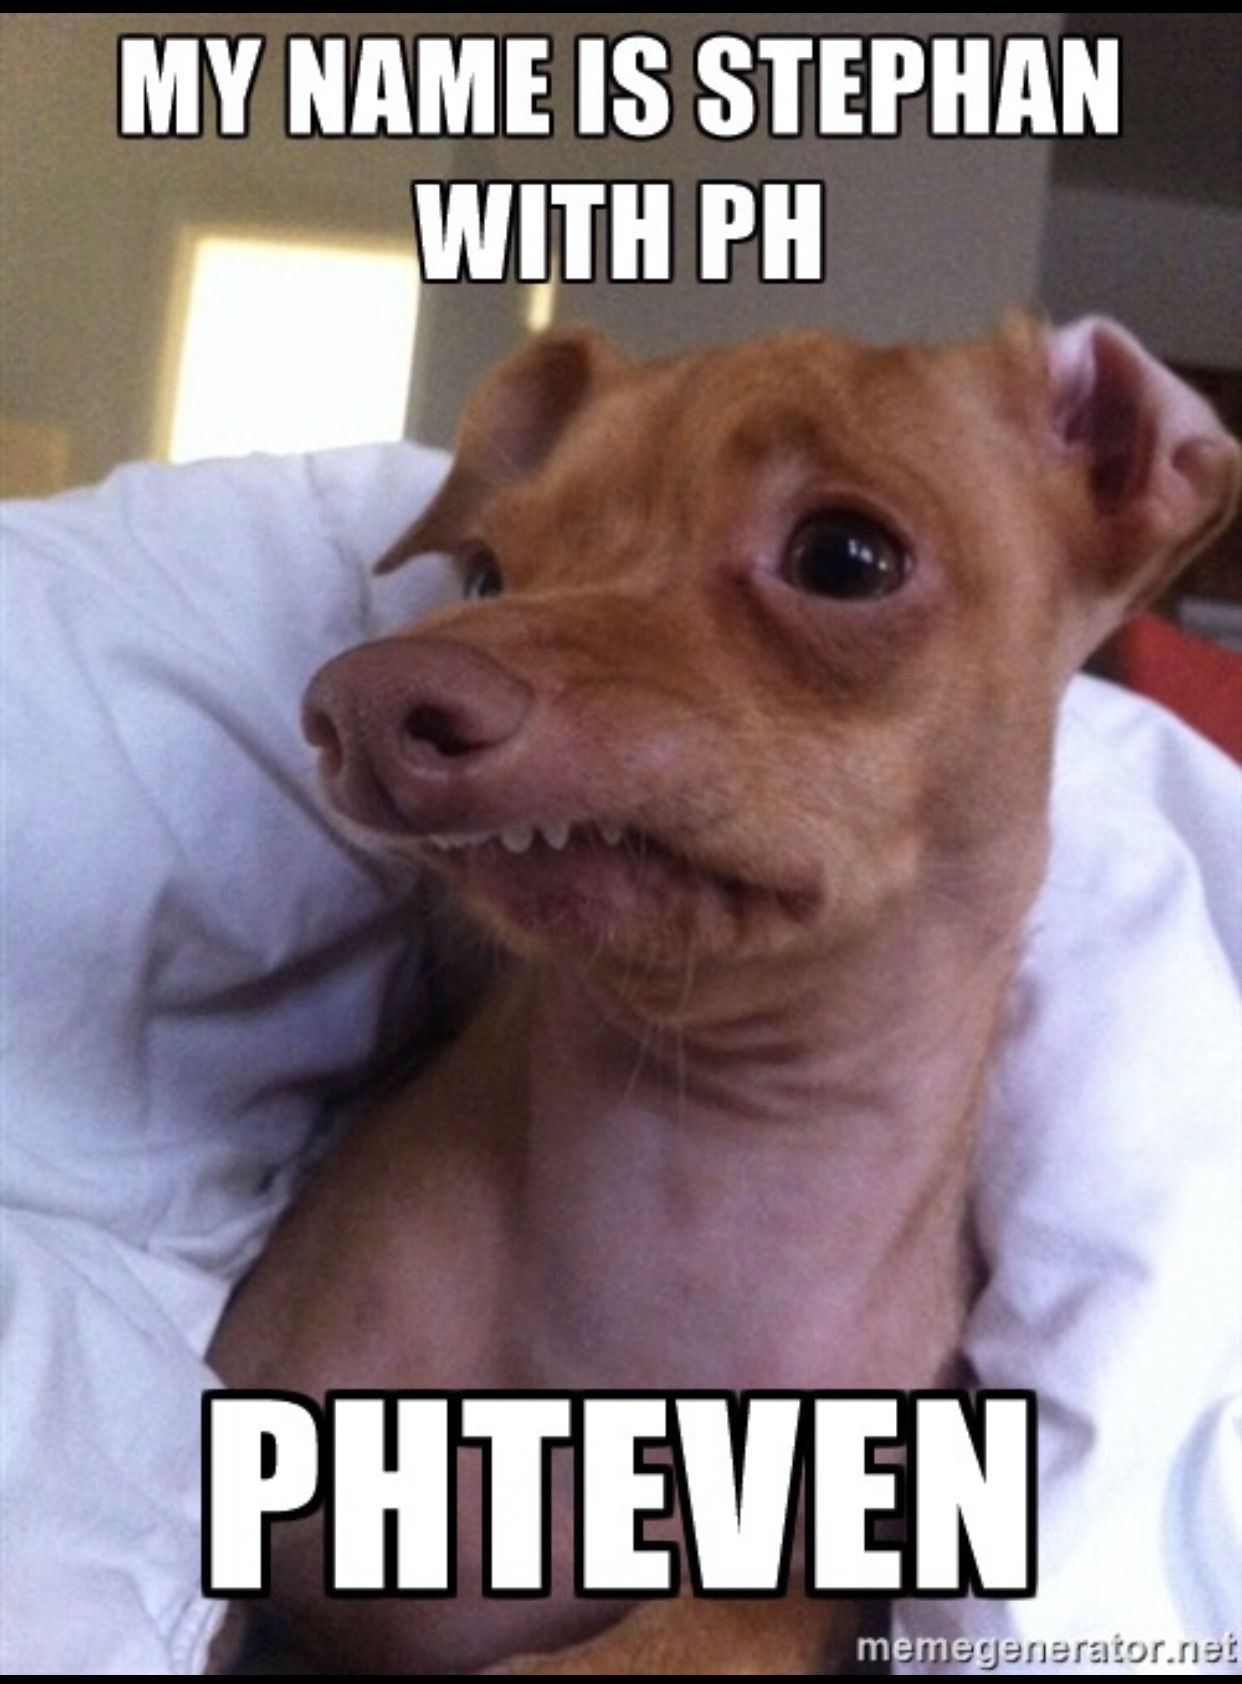 Steven with a PH | Phteven | Pinterest | Tuna melts, Tuna ... - photo#22